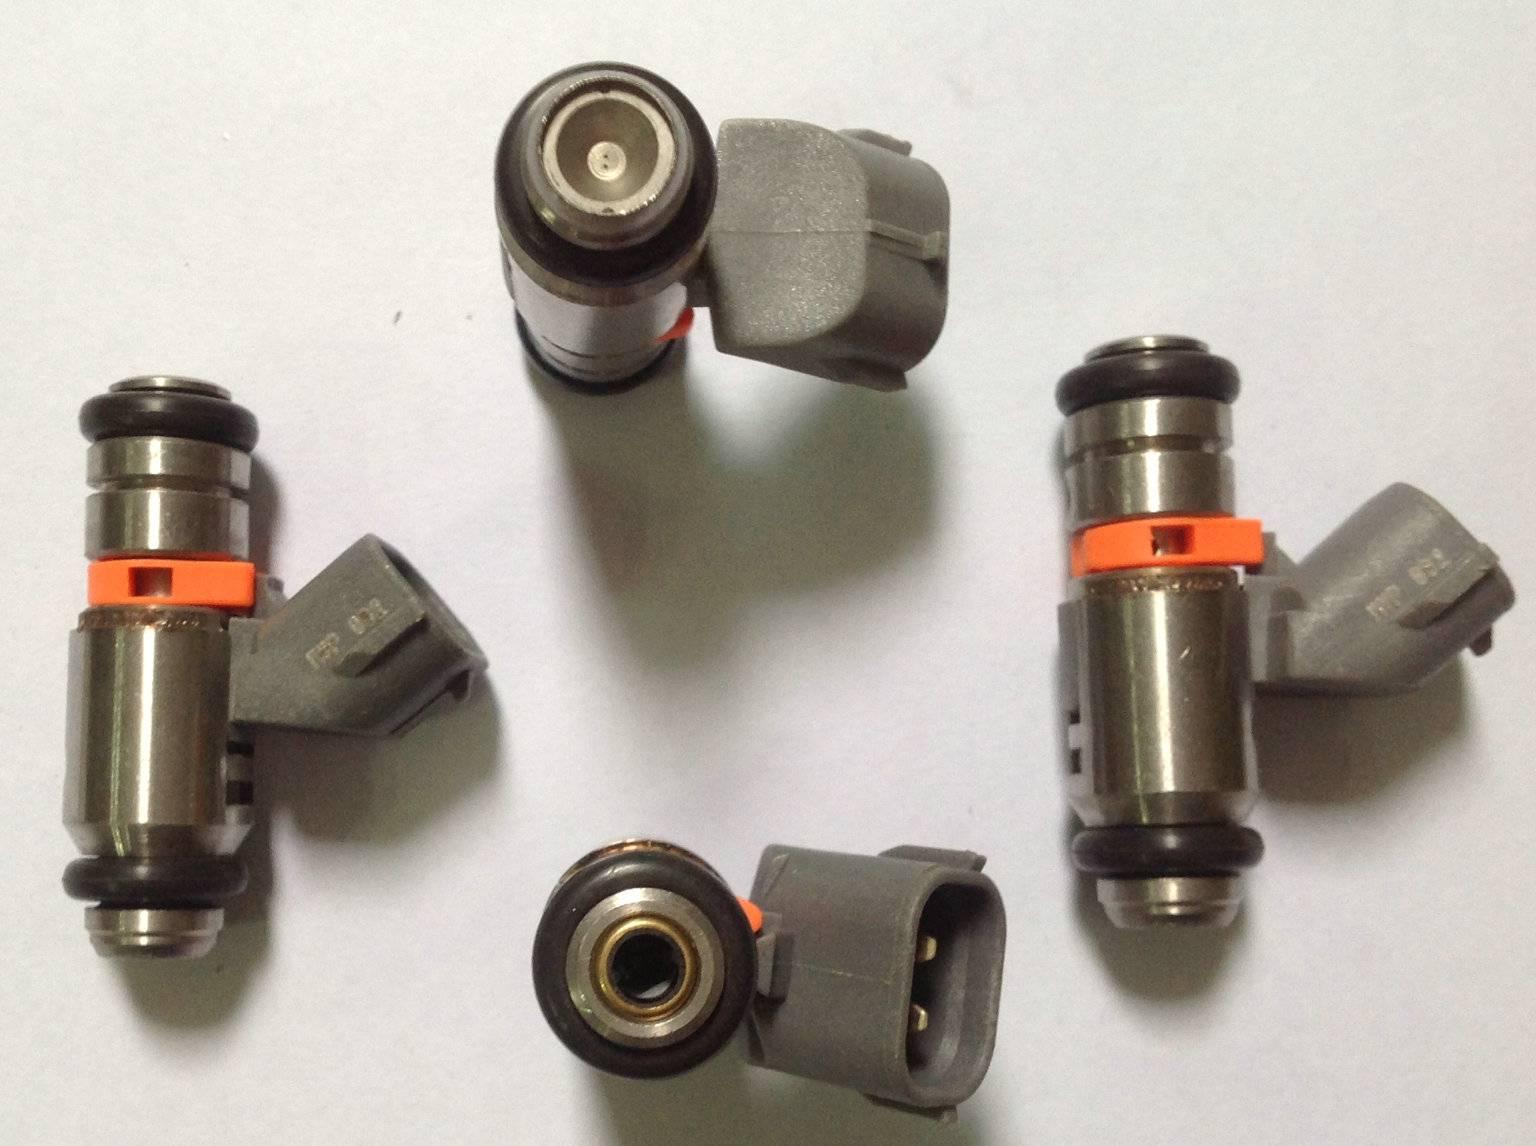 IWP022 fuel injector 021906031B VW Volkswagen Bora 1J AB 09/98/ 1998-2001 2.3 L